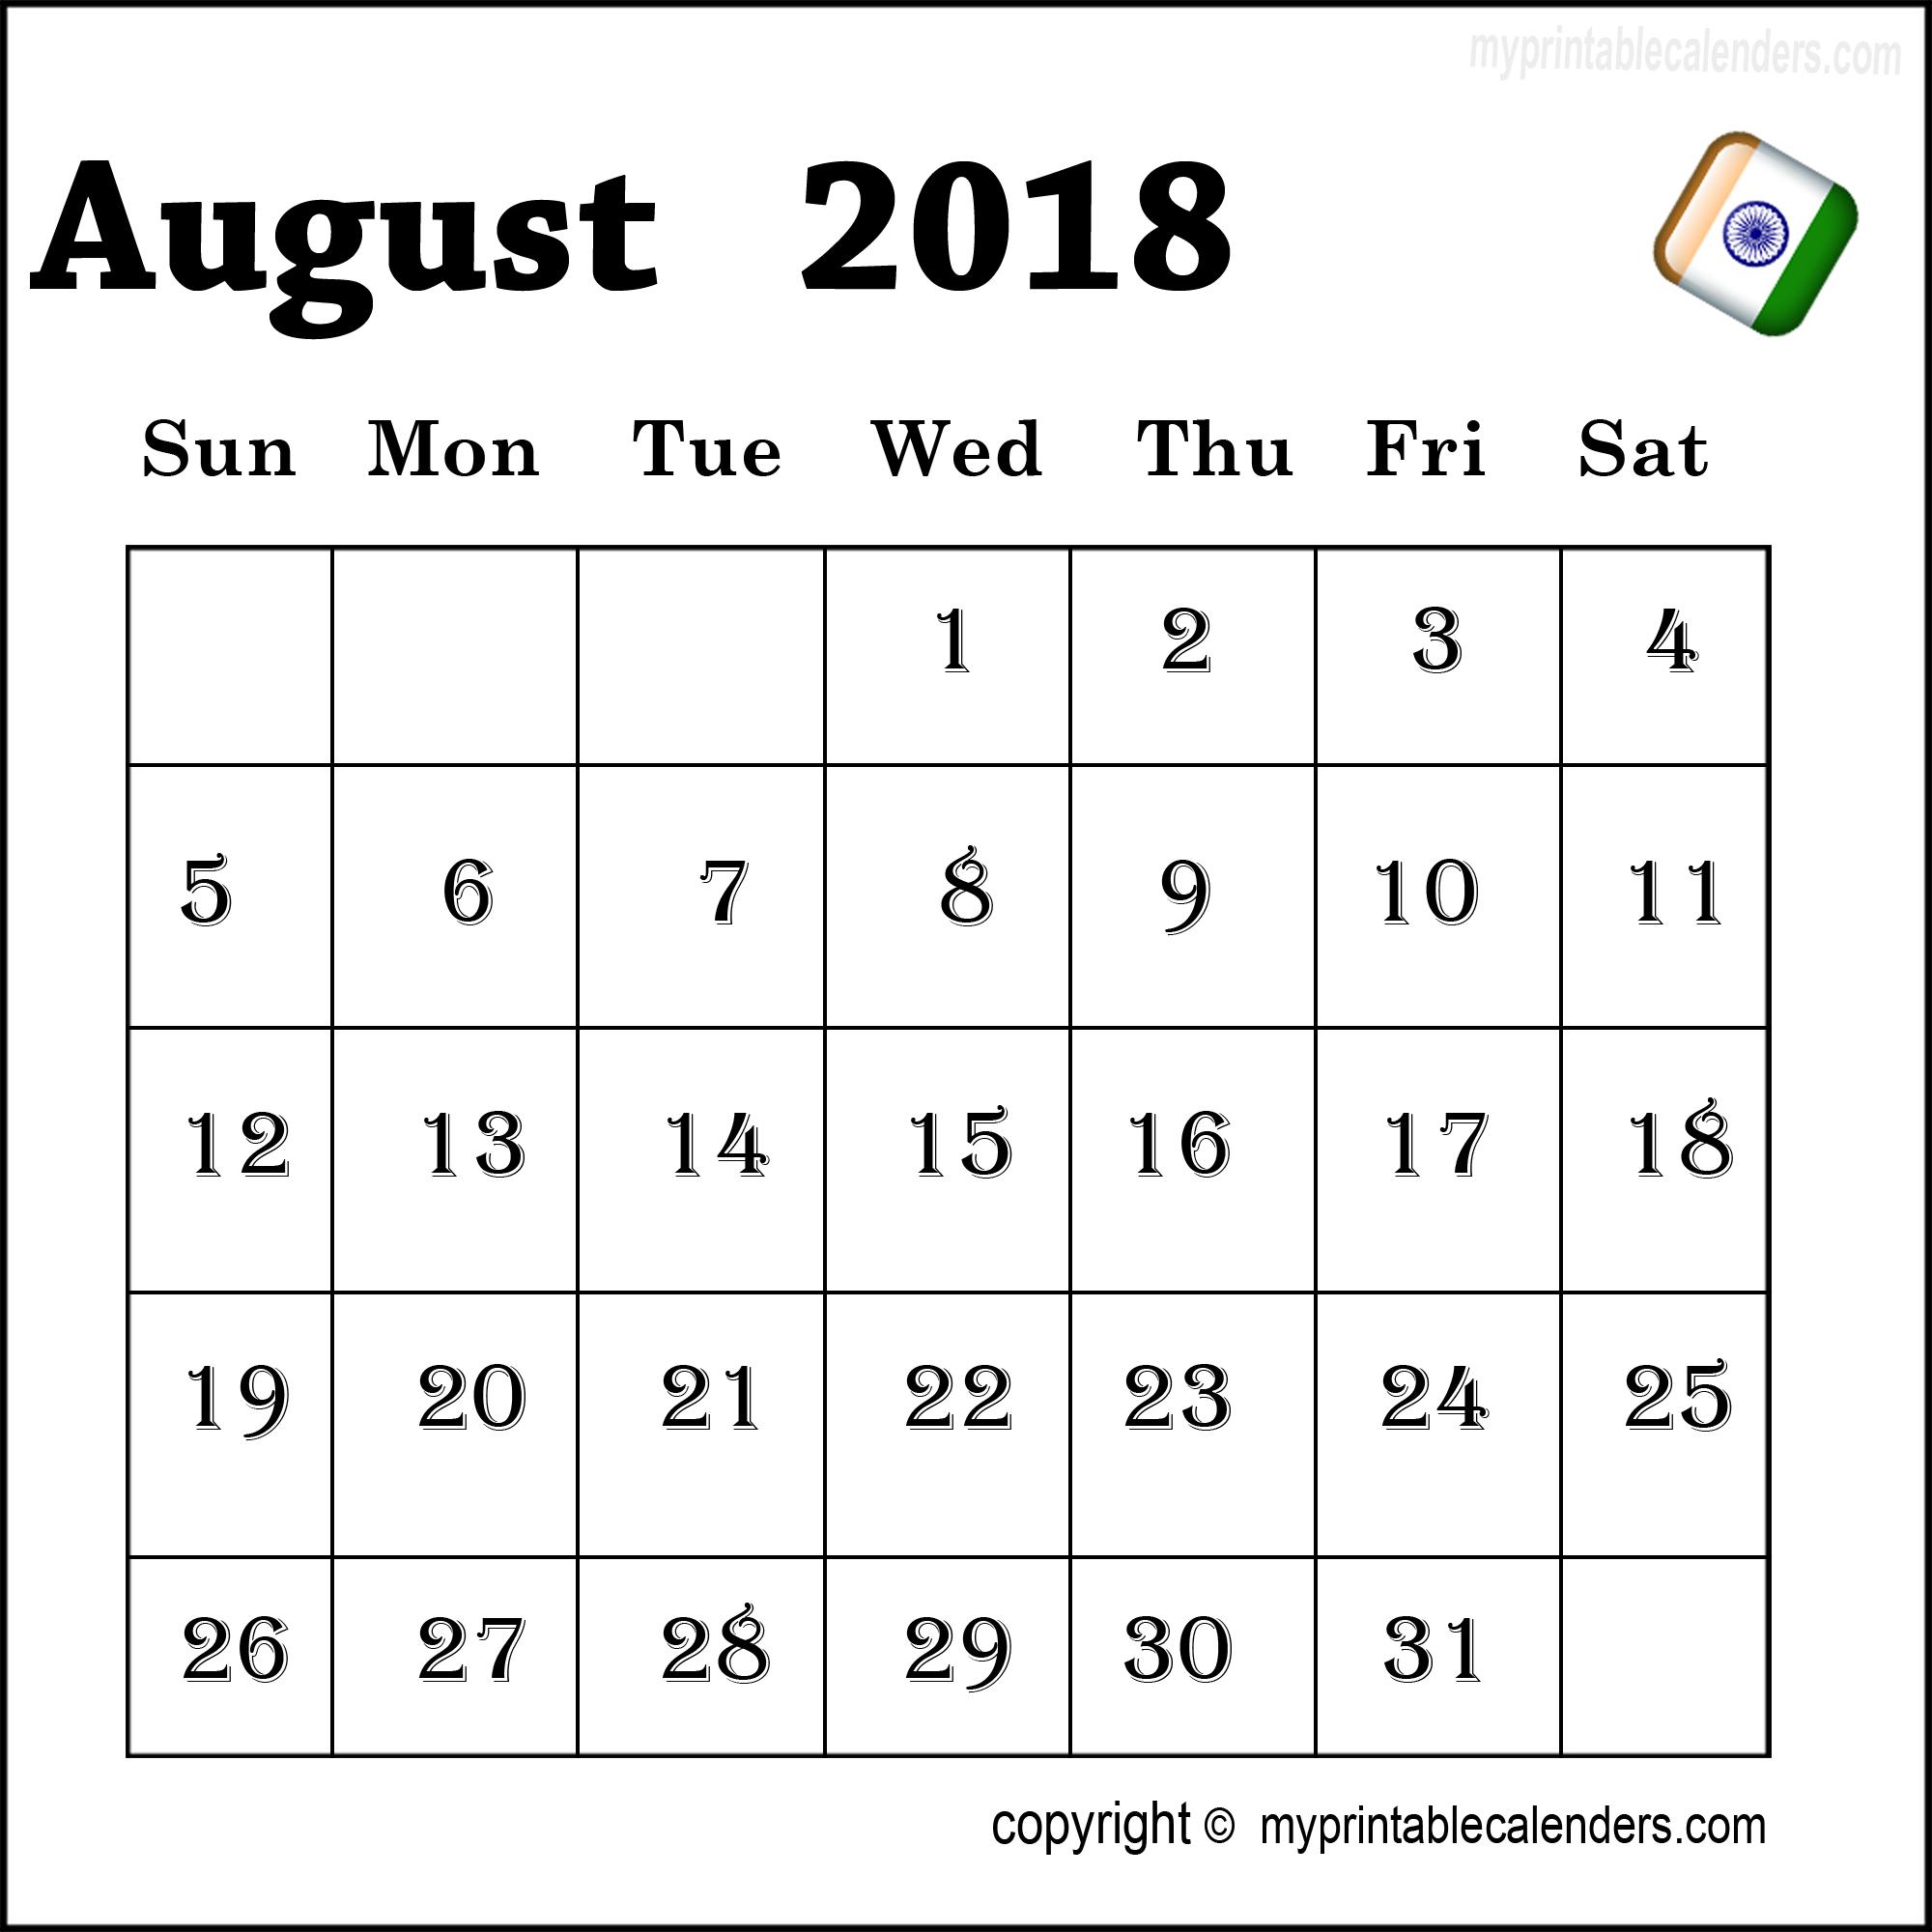 Printable August 2018 India Calendar